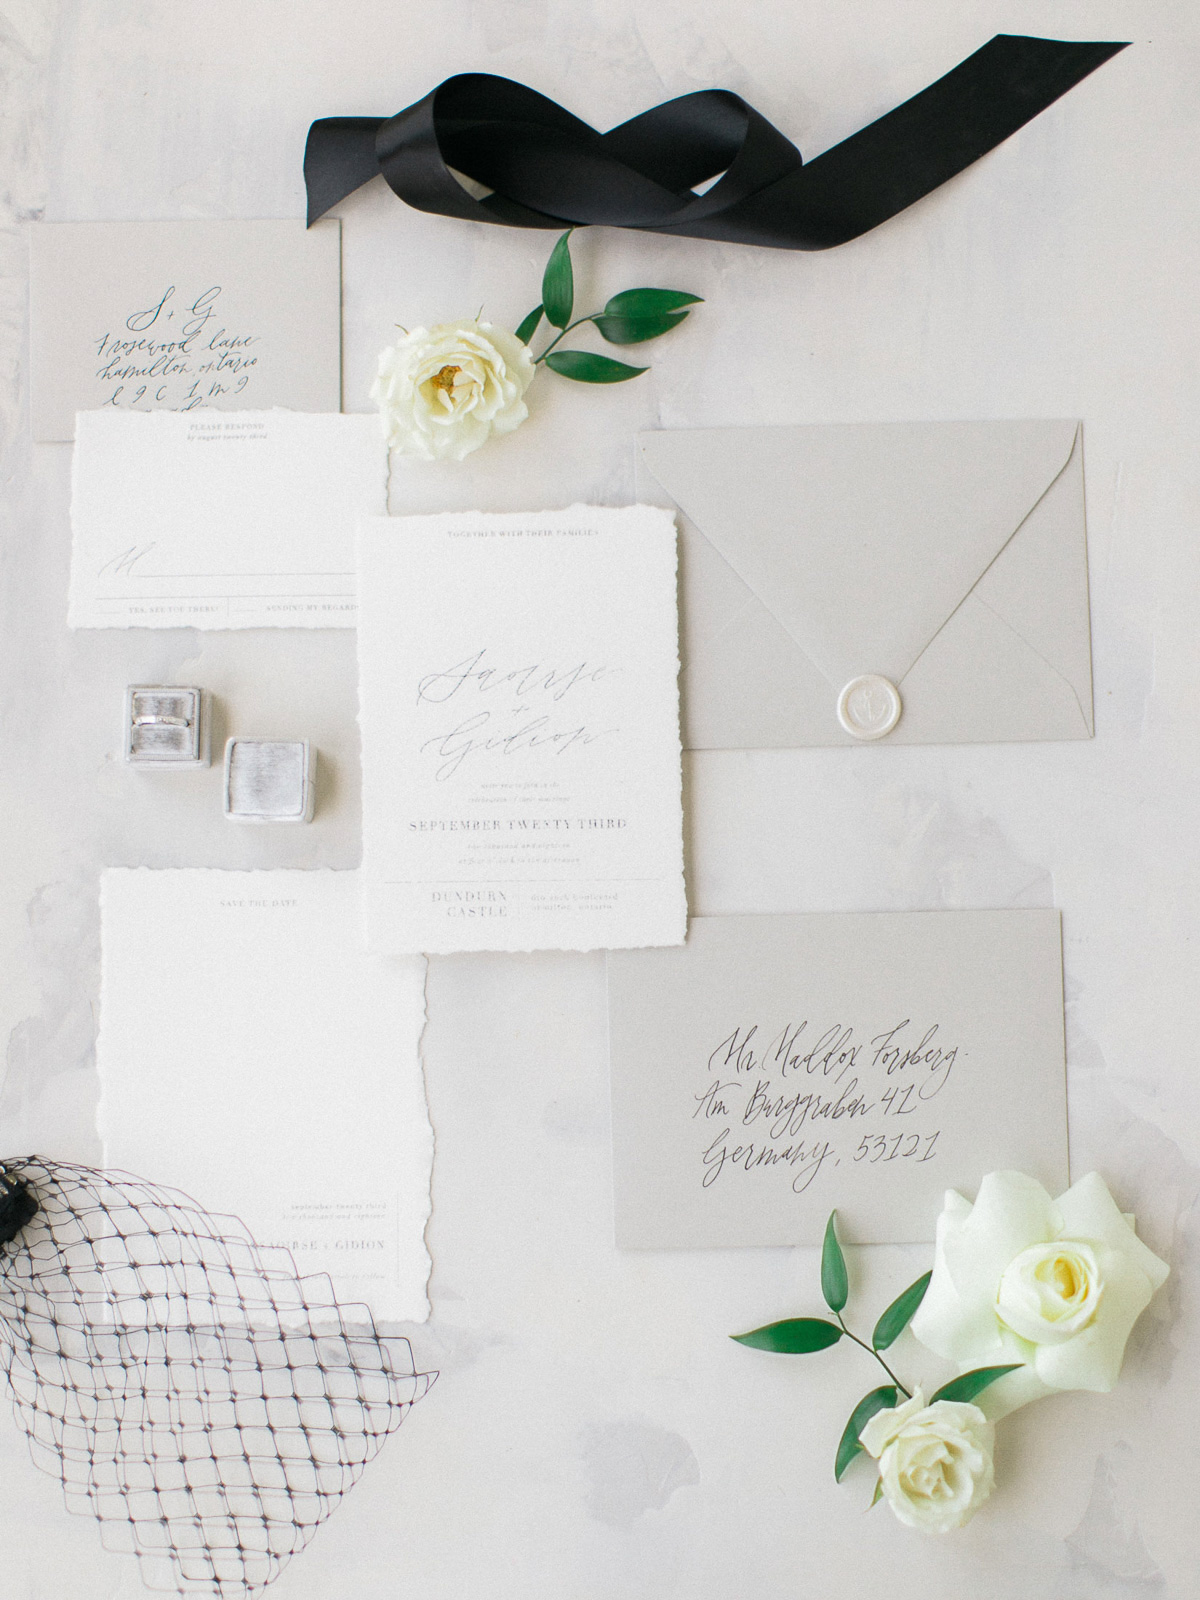 kurtz-orpia-photography-vineyard-bride-swish-list-dundurn-castle-dundas-wedding-editorial-3.jpg